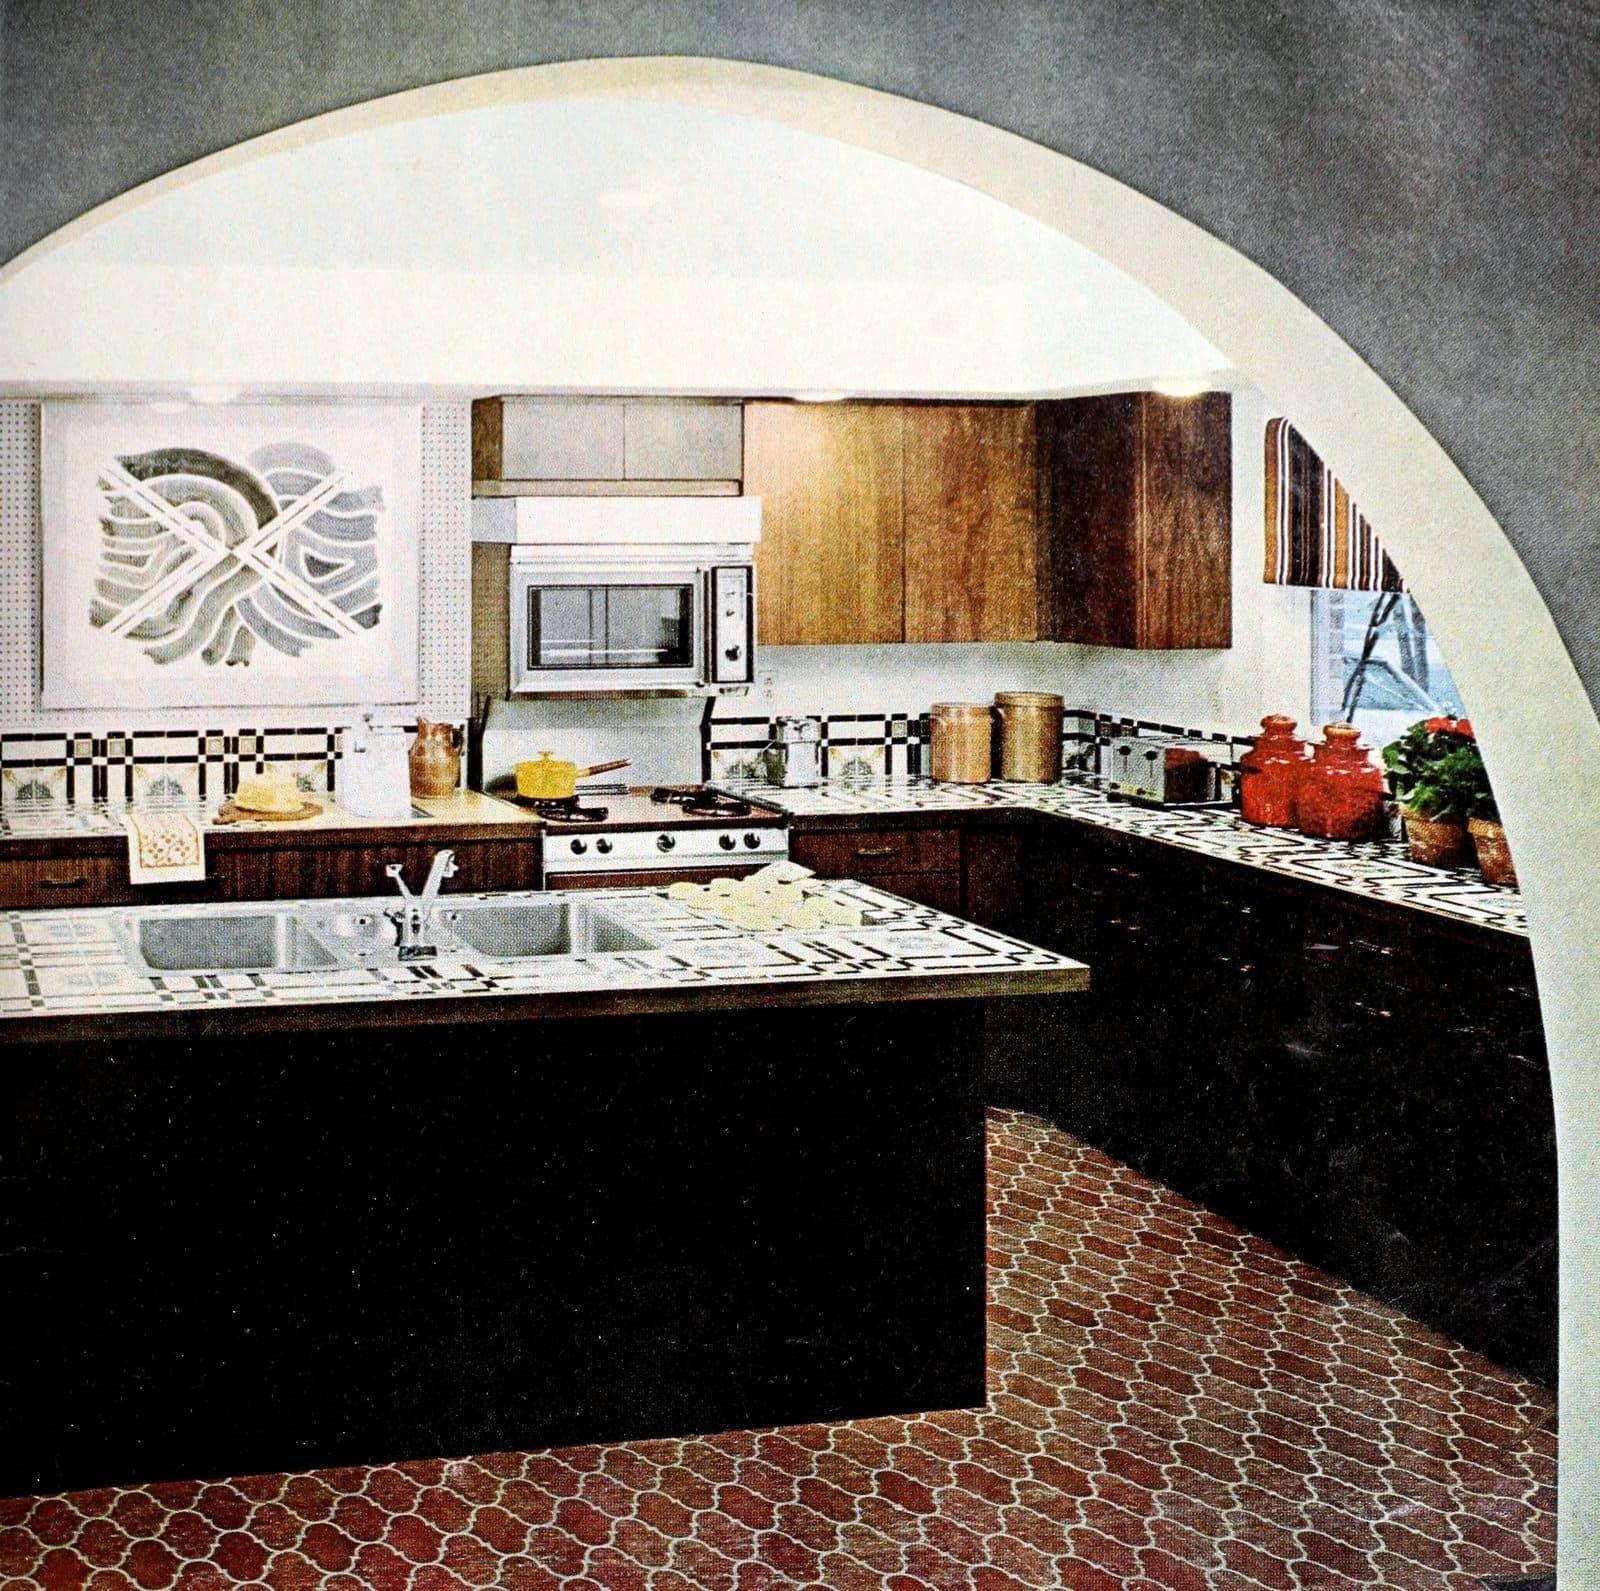 Decorative vintage 1960s kitchen design with tile (1967)